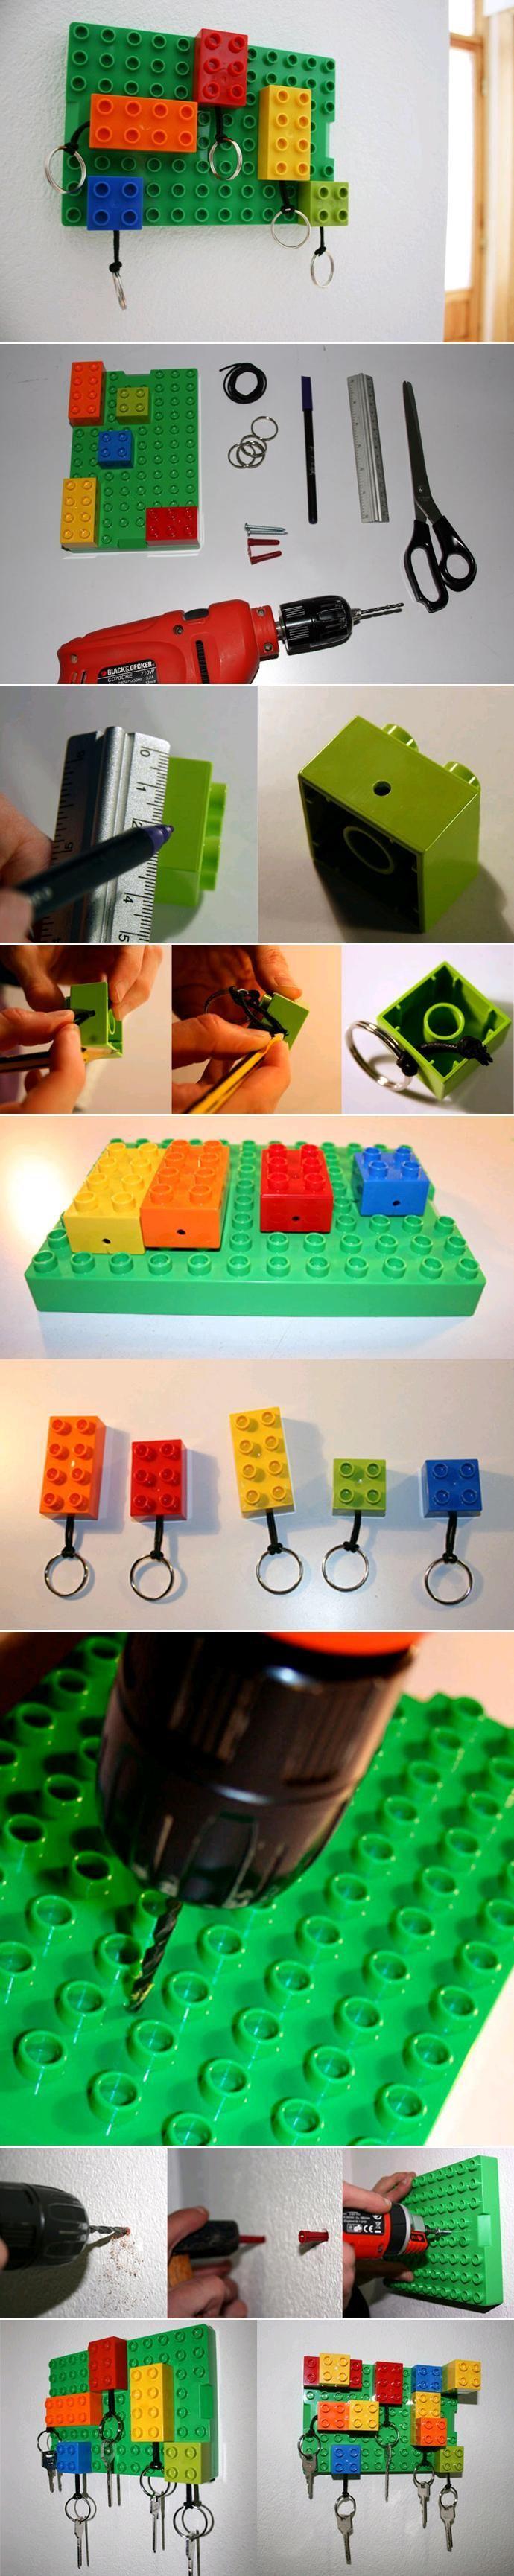 "<input+type=""hidden""+value=""""+data-frizzlyPostContainer=""""+data-frizzlyPostUrl=""http://www.usefuldiy.com/diy-lego-key-hanger/""+data-frizzlyPostTitle=""DIY+Lego+Key+Hanger""+data-frizzlyHoverContainer=""""><p>>>>+Craft+Tutorials+More+Free+Instructions+Free+Tutorials+More+Craft+Tutorials</p>"